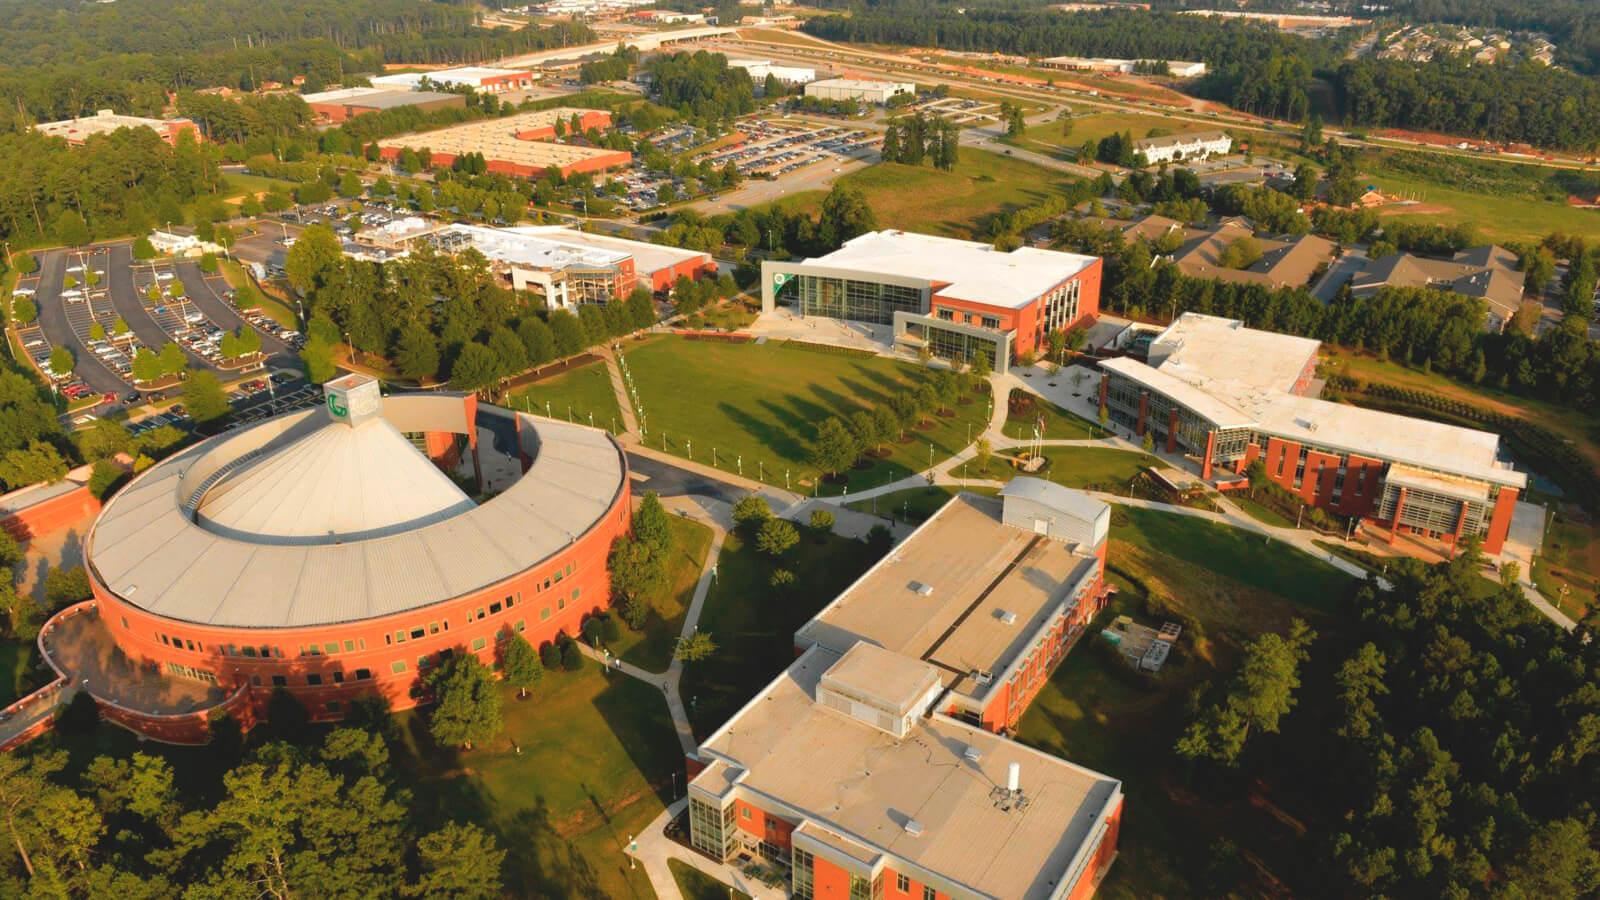 Georgia Gwinnett College | Cappex intended for Georgia State Perimeter Campus School Calander